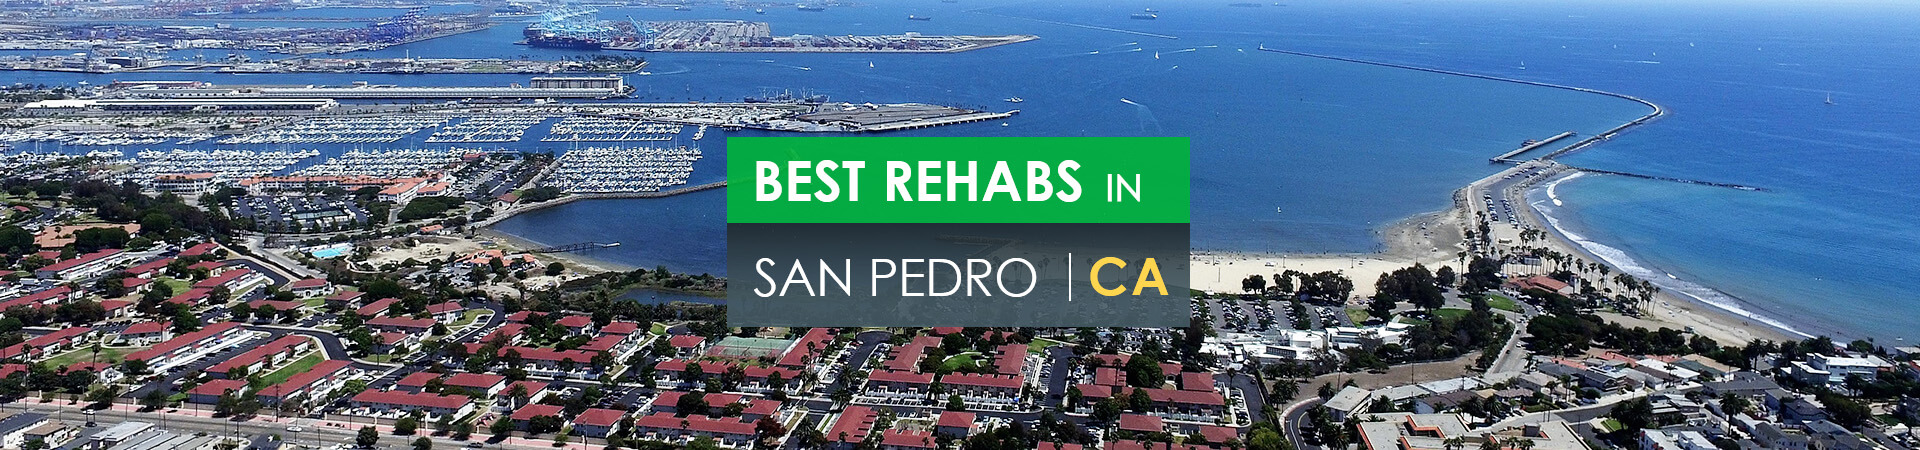 Best rehabs in San Pedro, CA